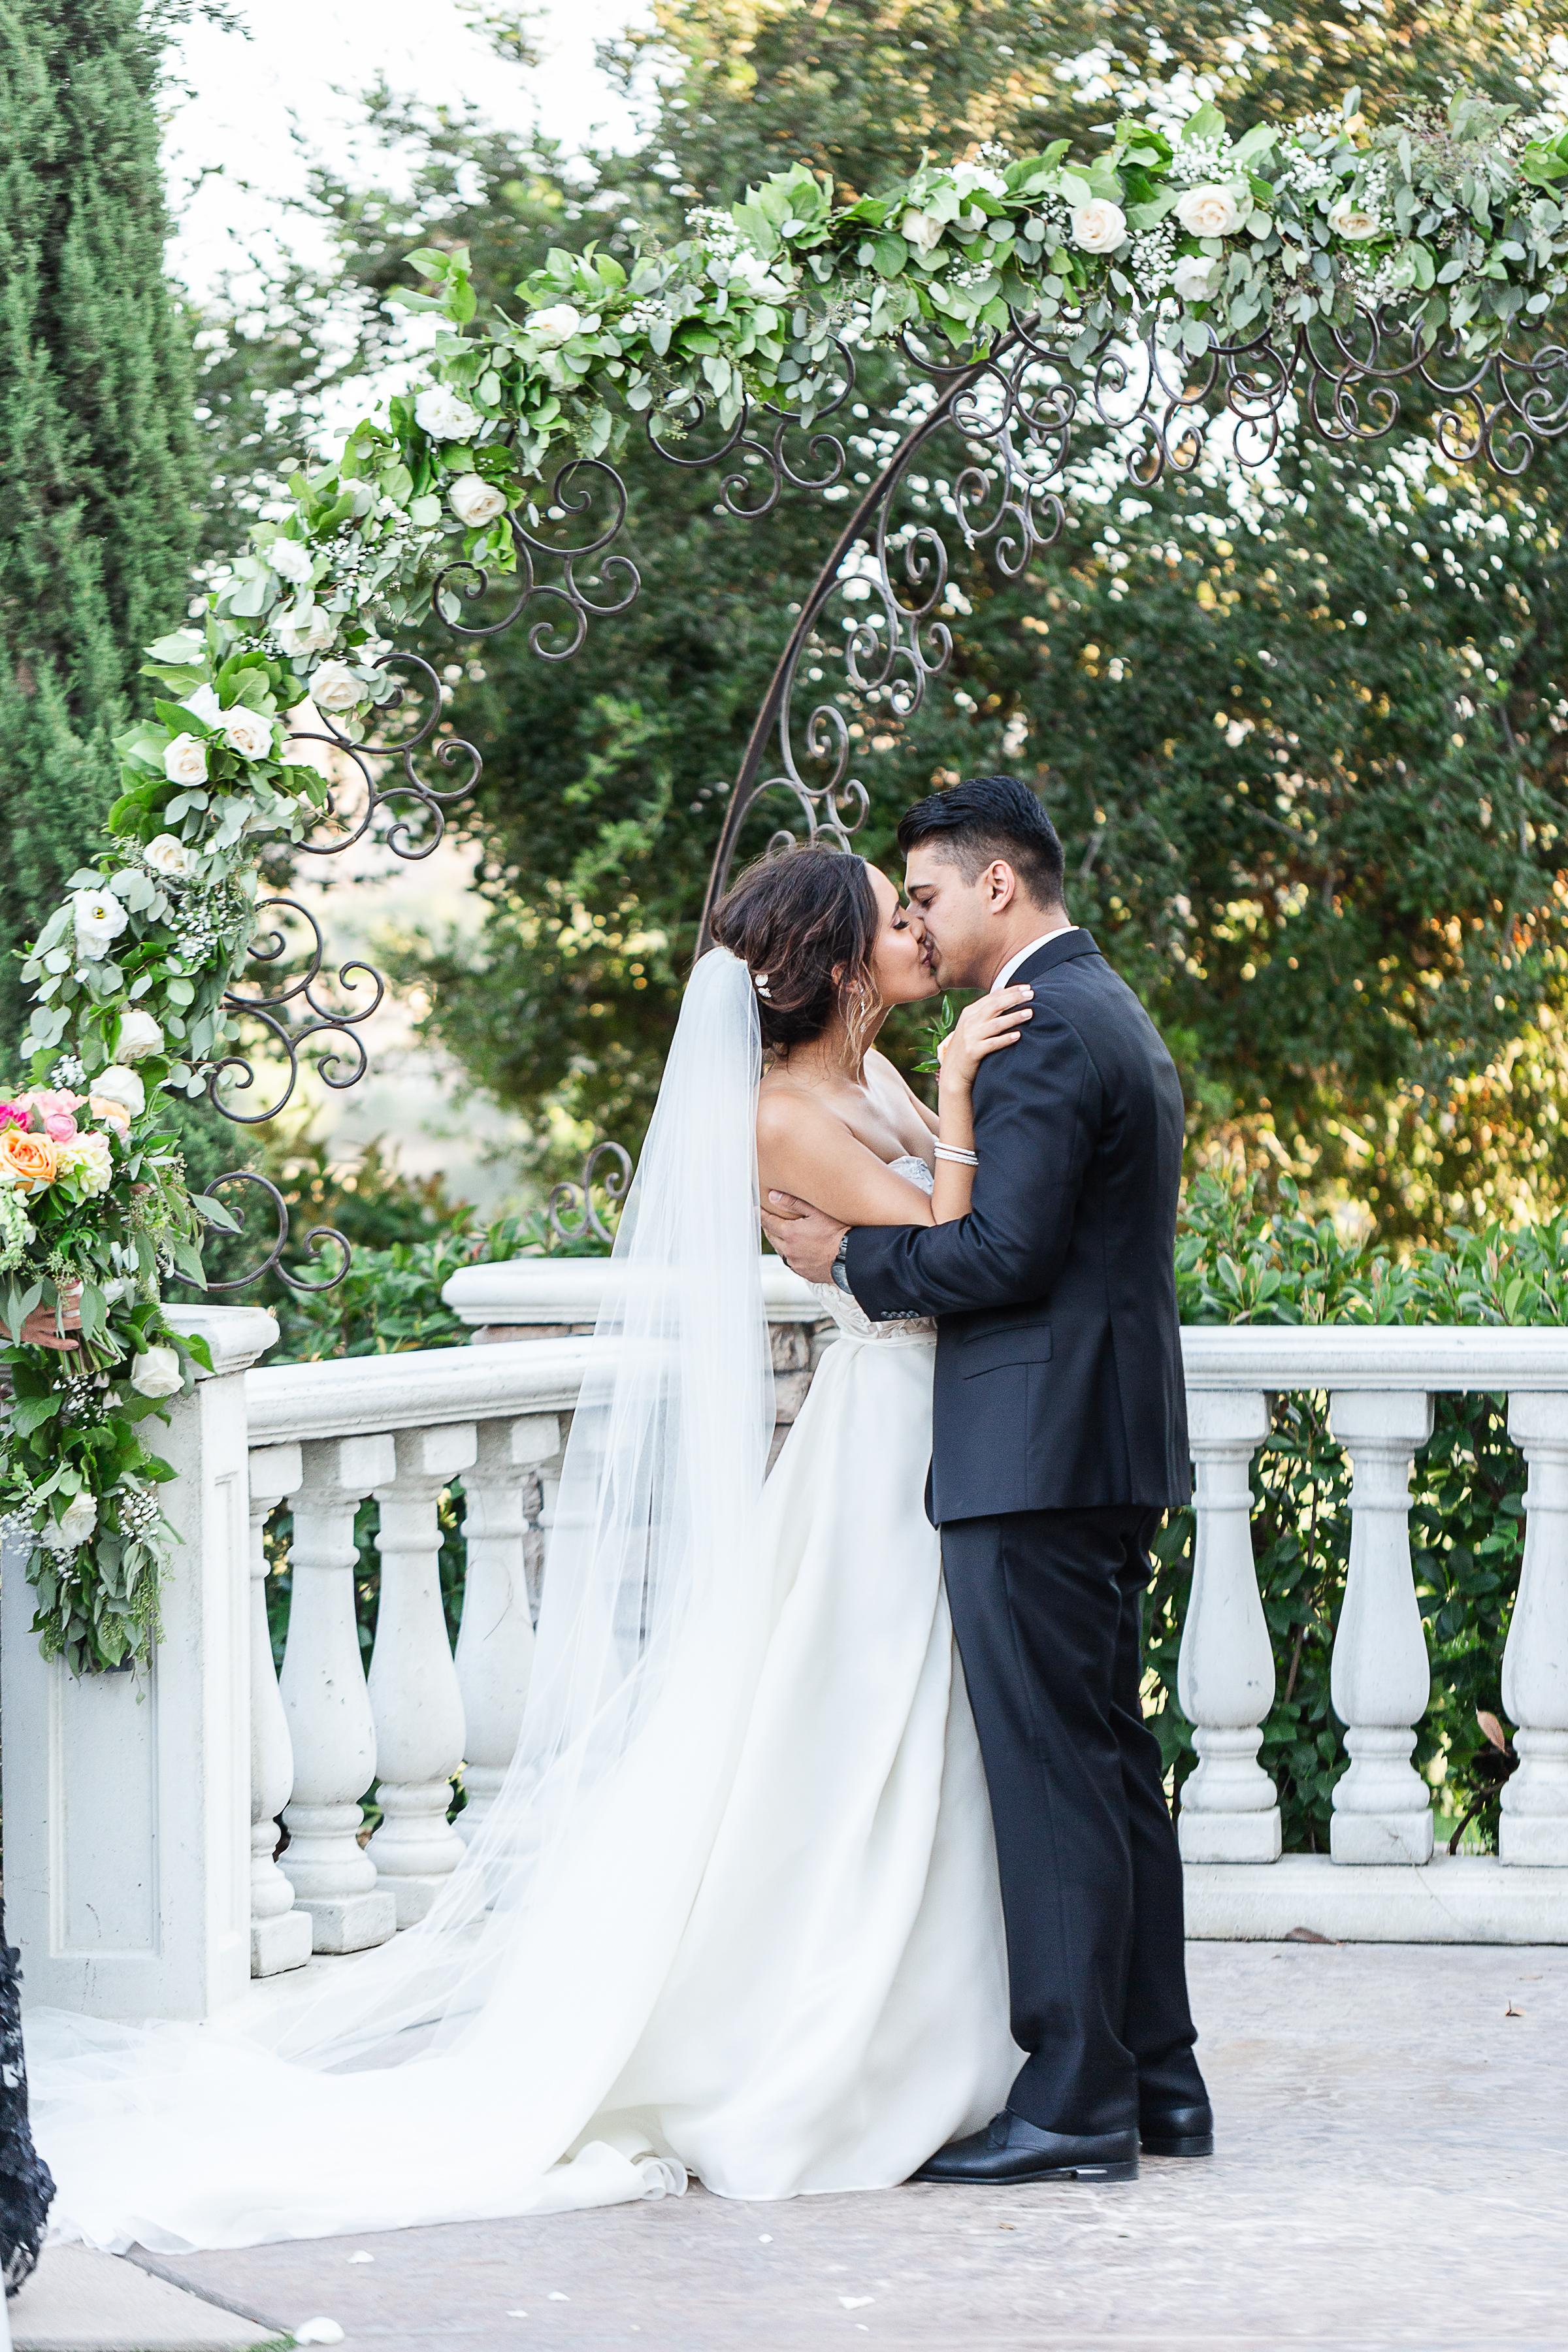 Medina and Arash's Vellano Country Club Wedding, Chino Hills-17.jpg